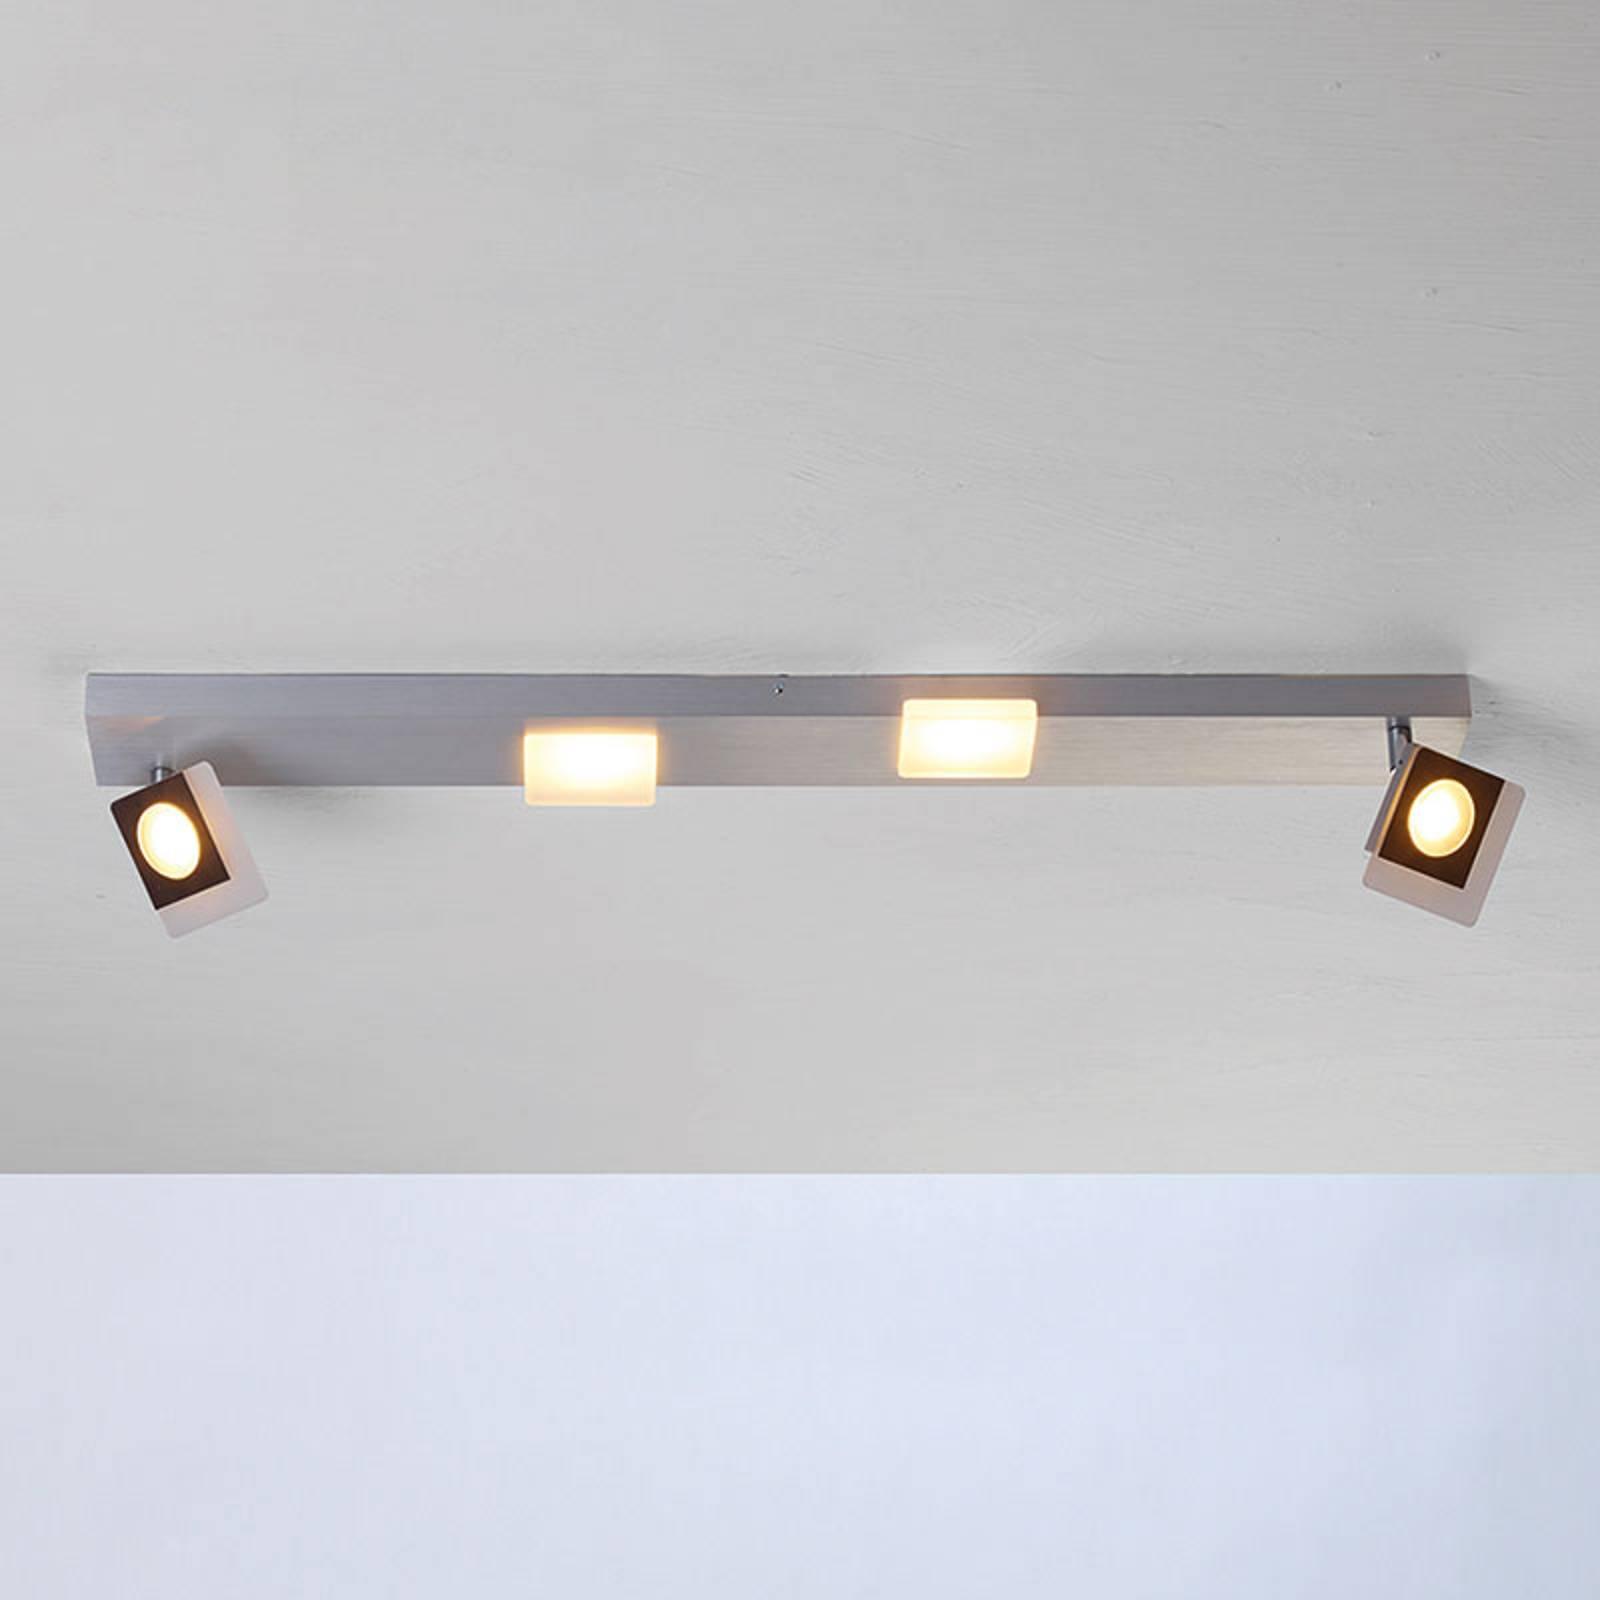 Bopp Session - lampa sufitowa LED z dwoma spotami